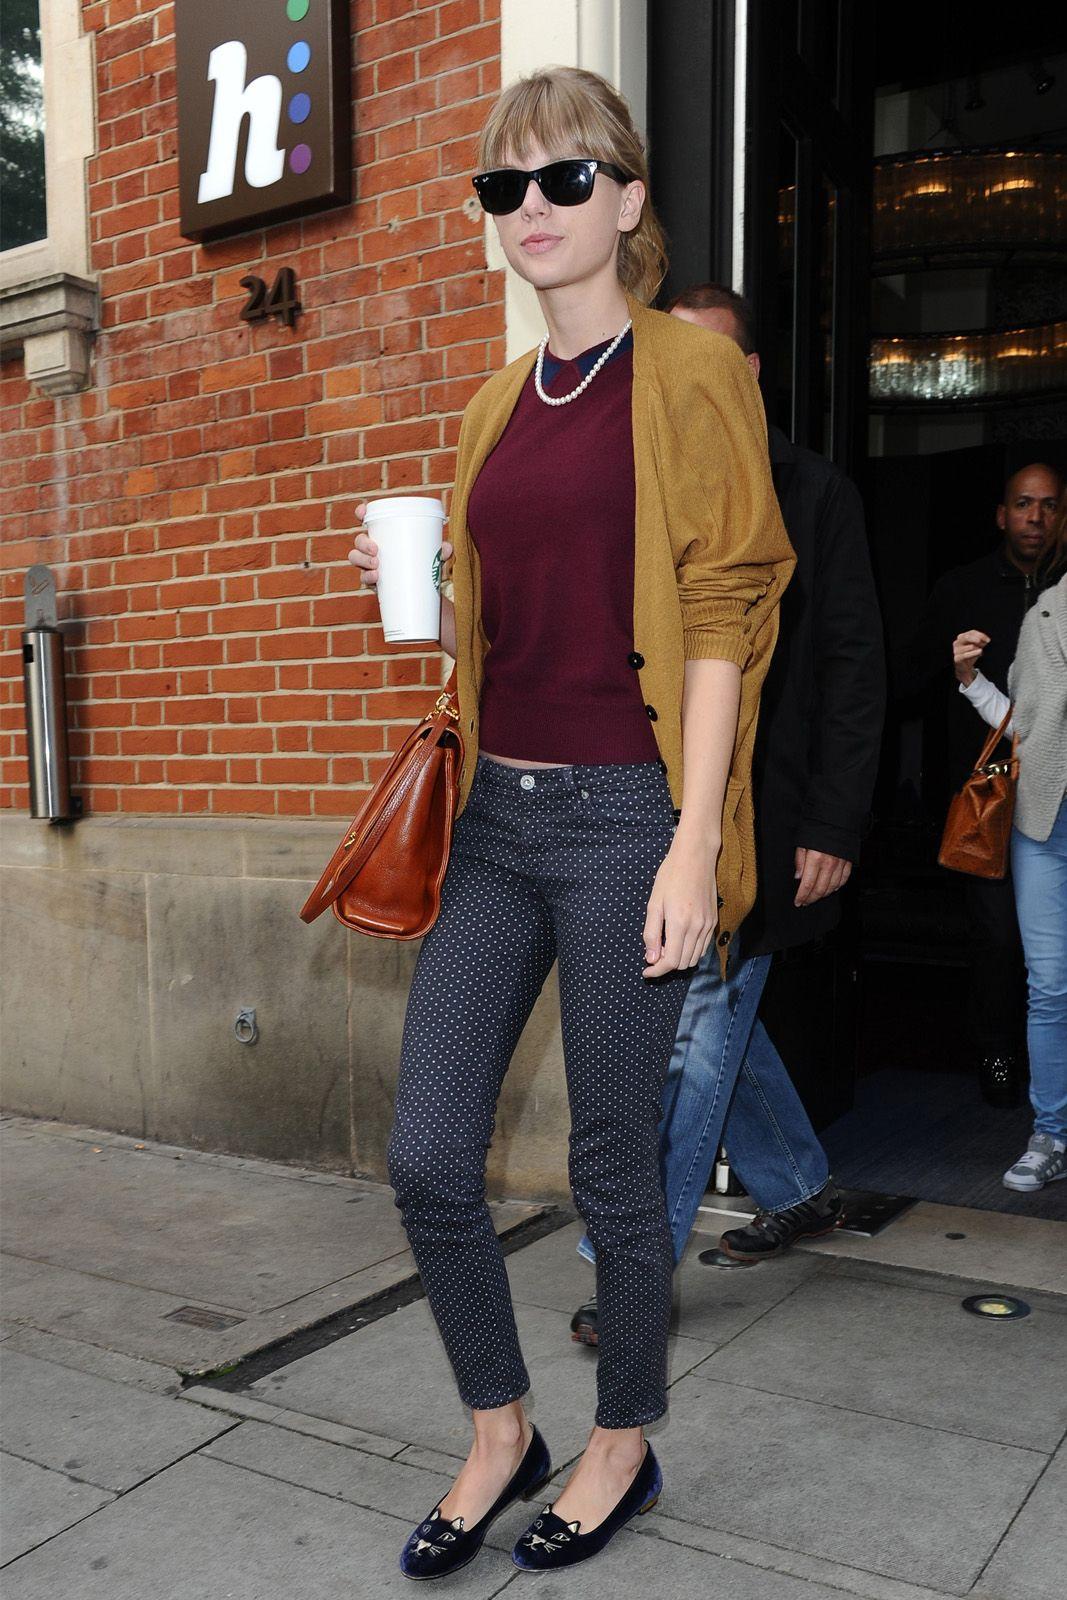 Super Chic! Tips dari Taylor Swift Ini Bisa Buat Gayamu Semakin Stylish!